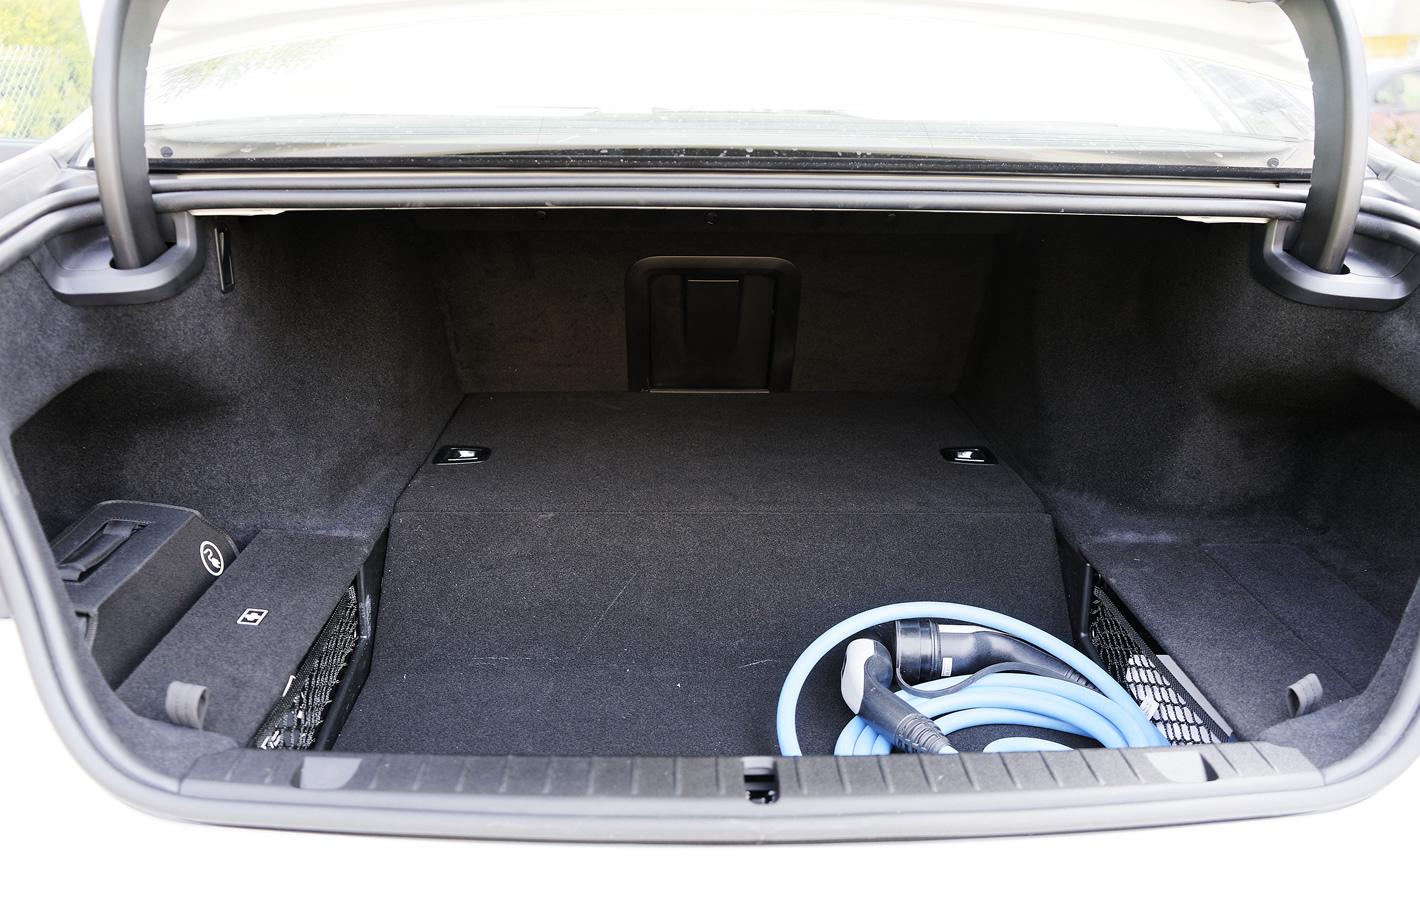 BMW 740e iPerformance Hybryda Plug-In - bagażnik